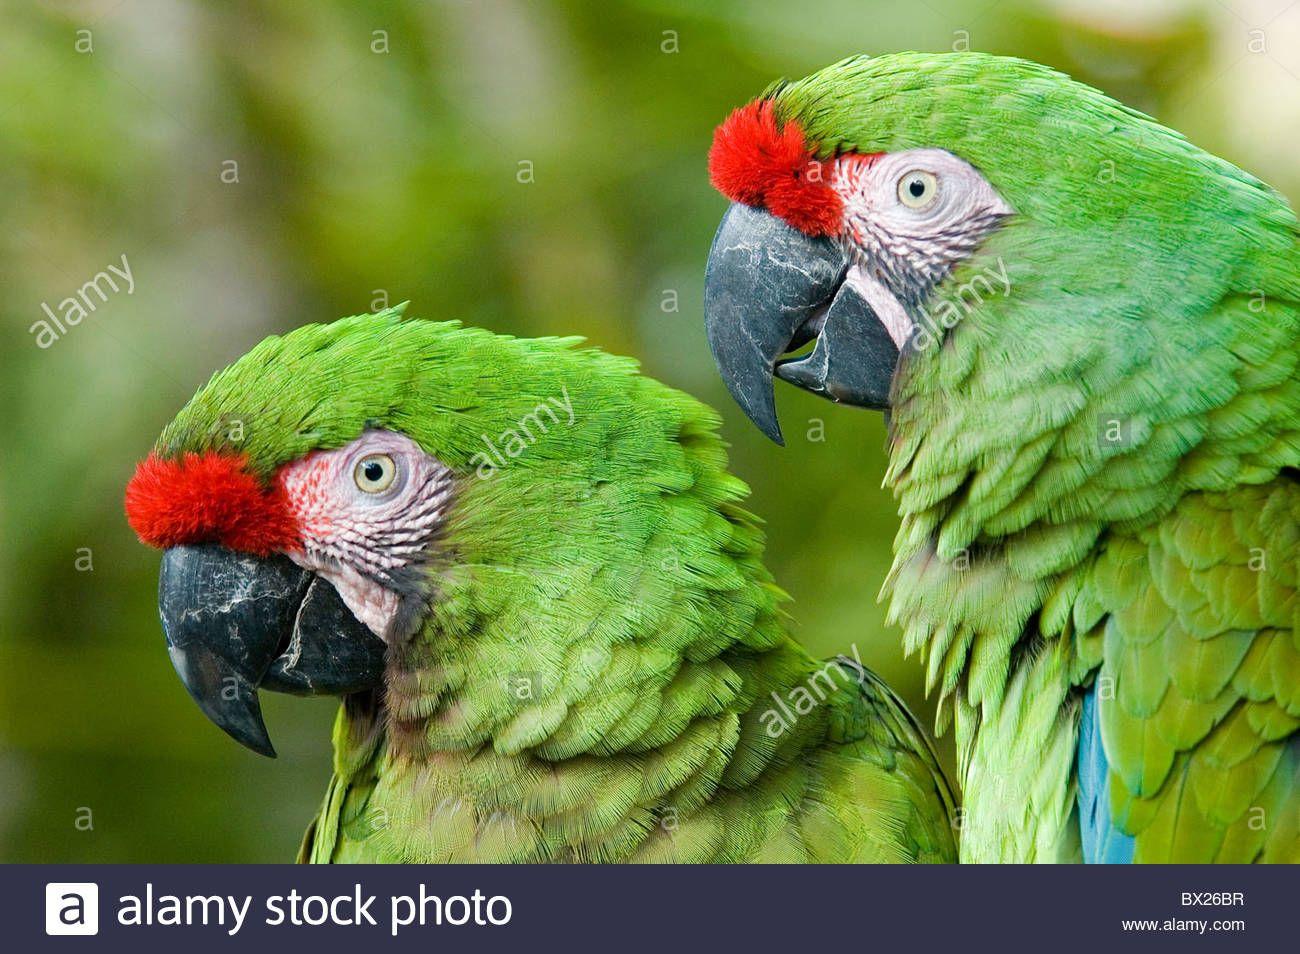 bird - Pesquisa Google